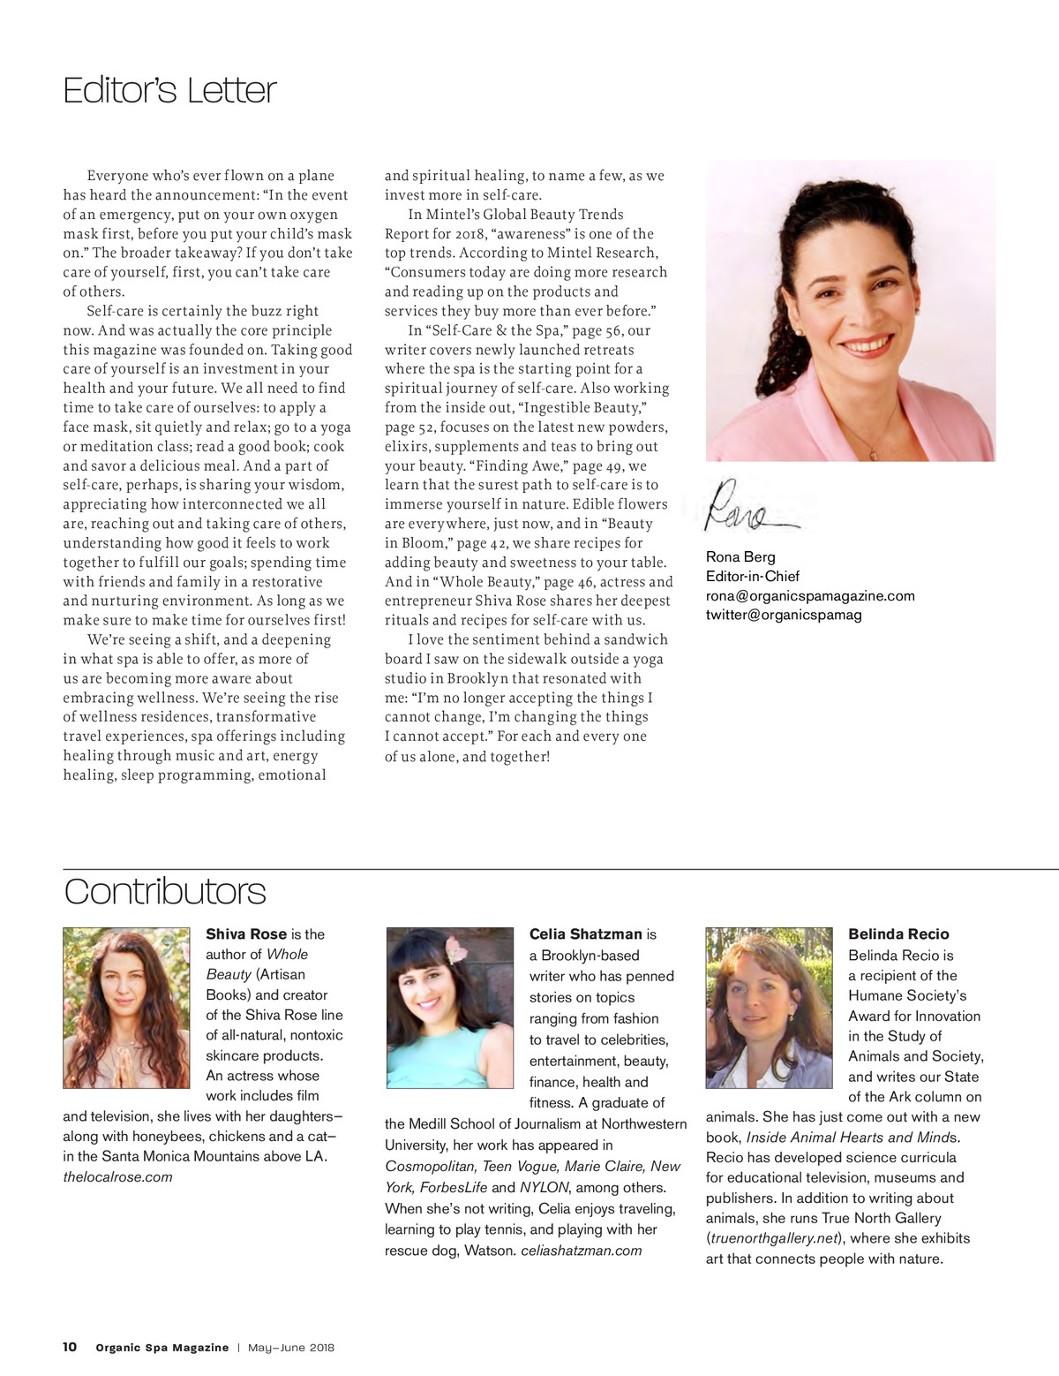 Organic Spa Magazine   June 2018   Inner Beauty & Self-Care